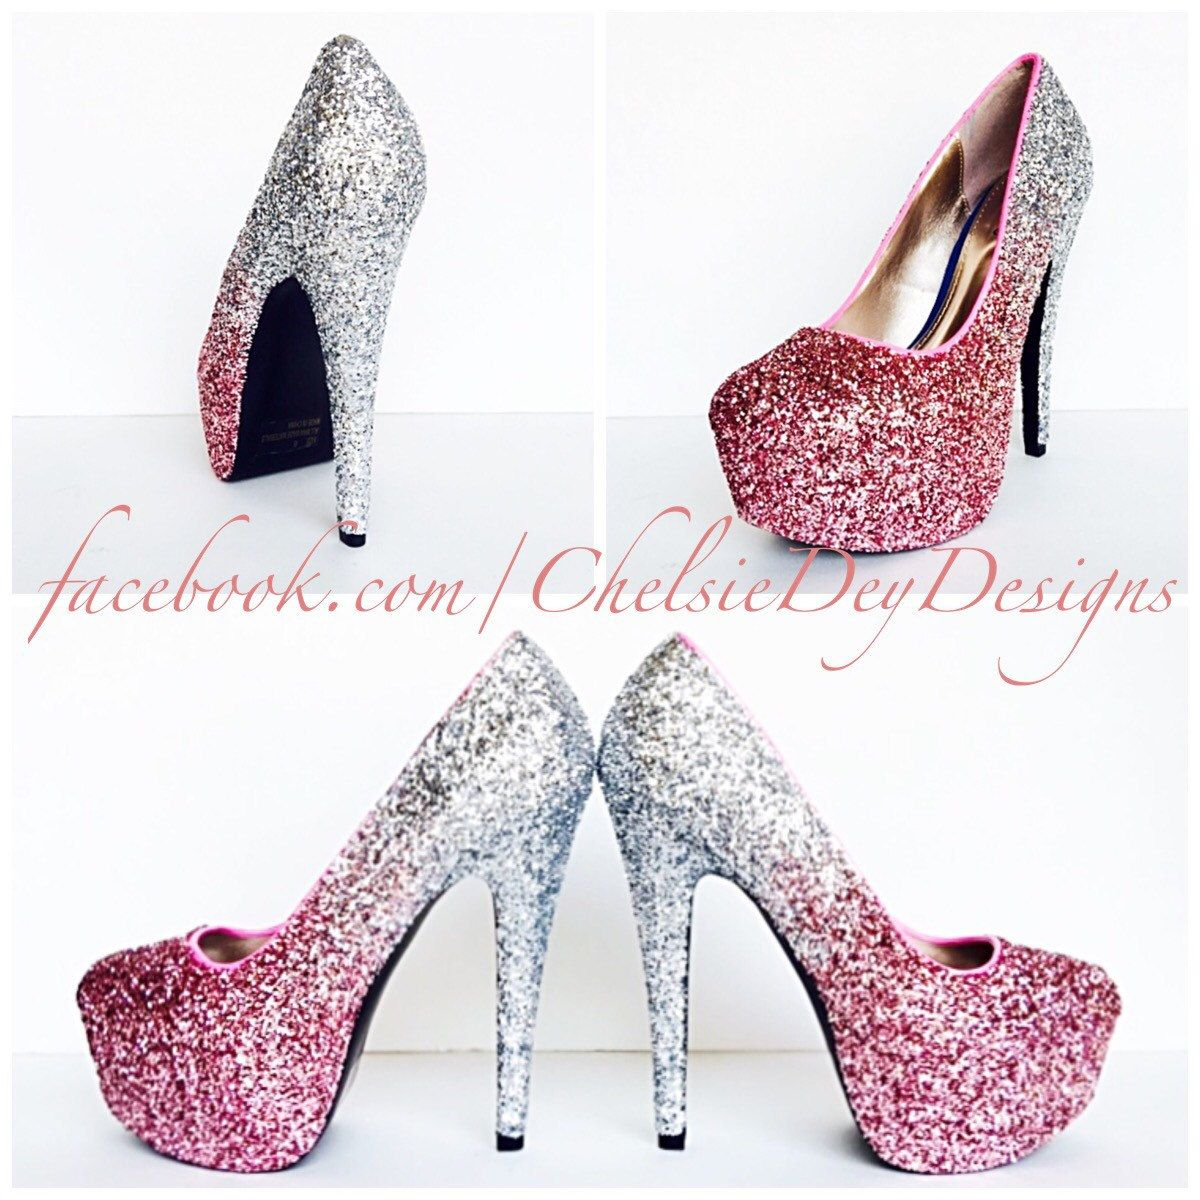 c8008dcdaaf4 Glitter High Heels - Blush Pink Pumps - Light Pink Silver Ombre Platform  Pumps - Sparkly